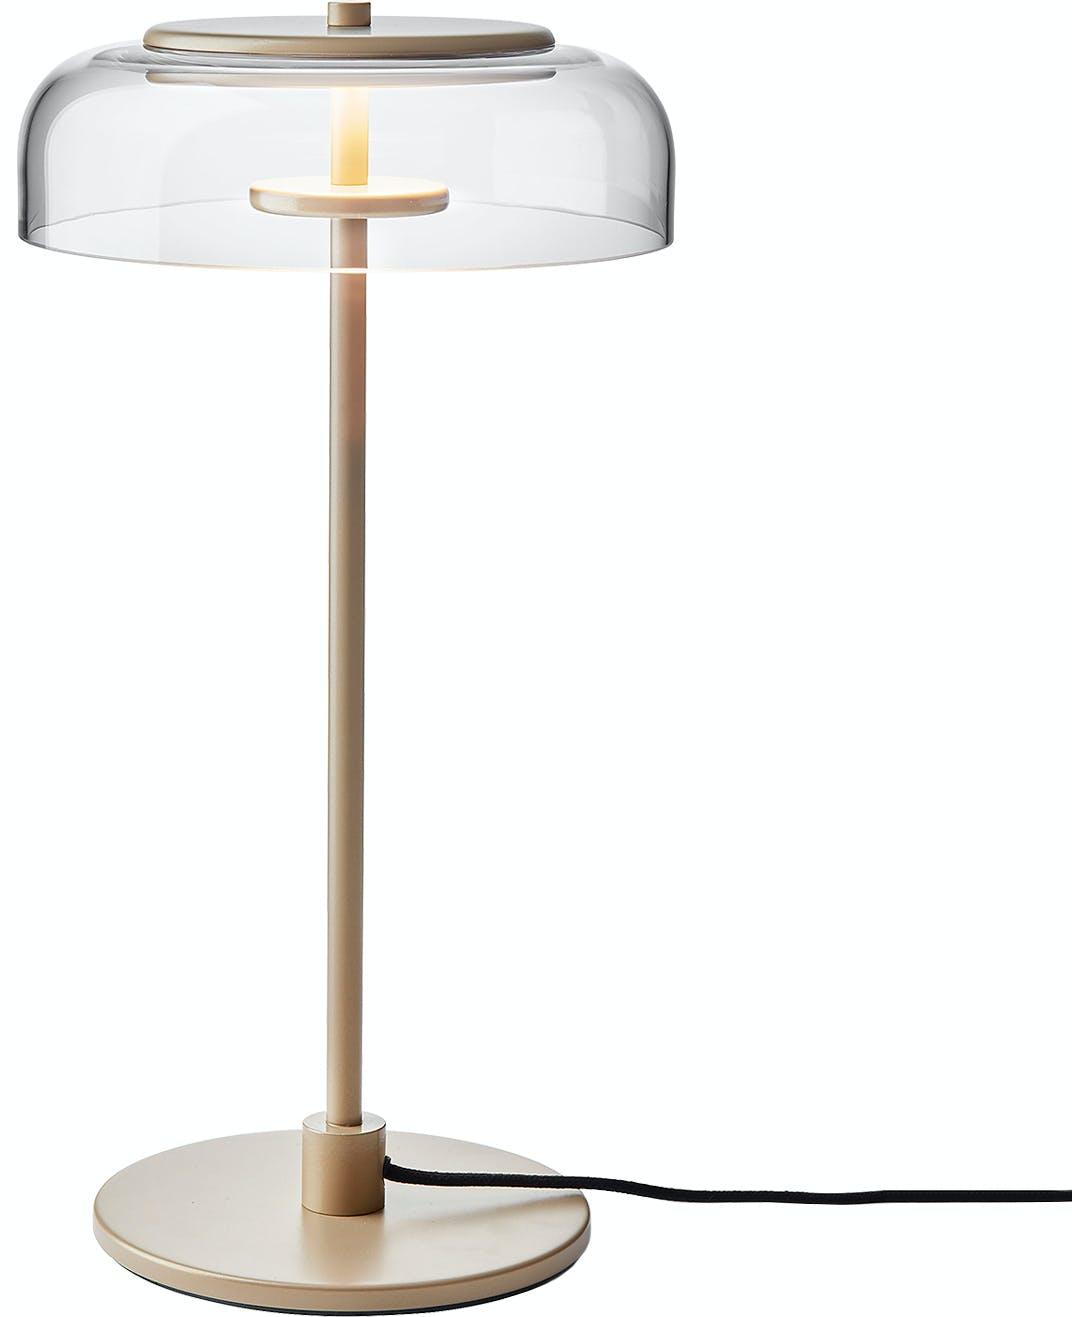 Nuura Blossi Table Lamp Thumb Haute Living